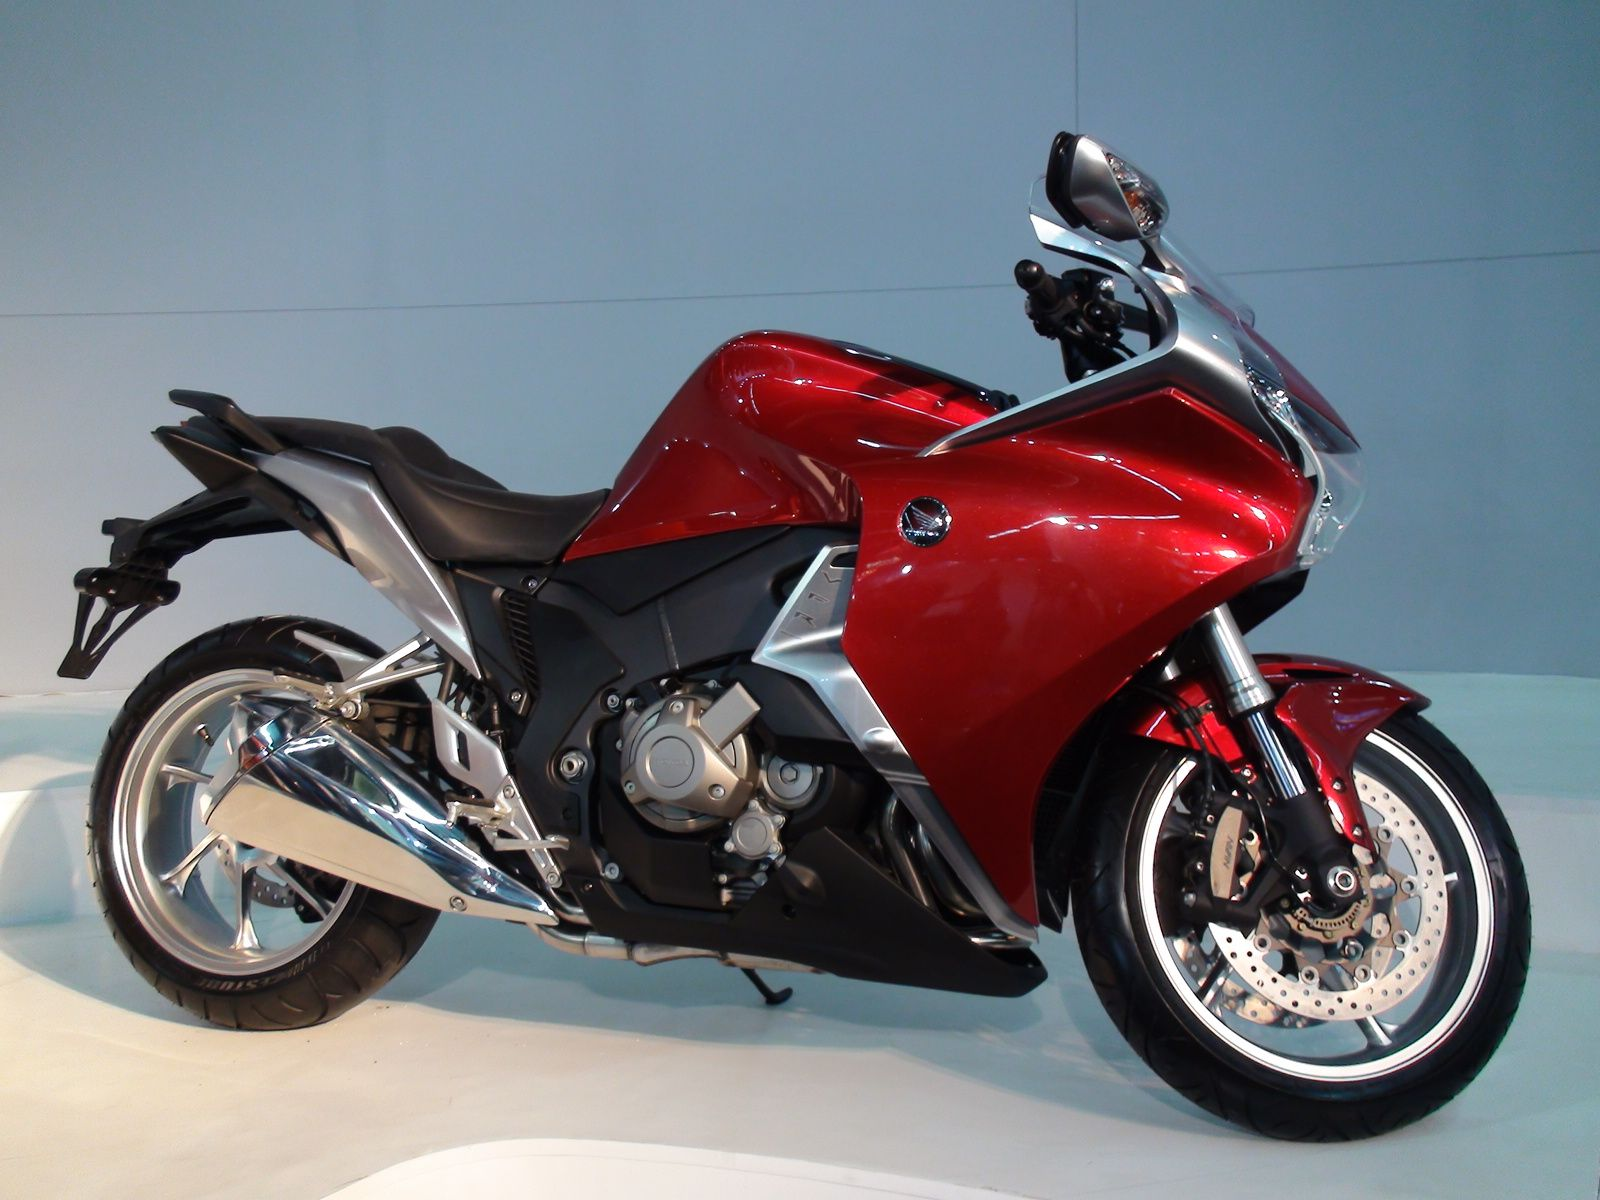 Honda S Automatic Motorcycle With Dual Clutch A Wish Worthy Bike Motorcycle Bike Bike News